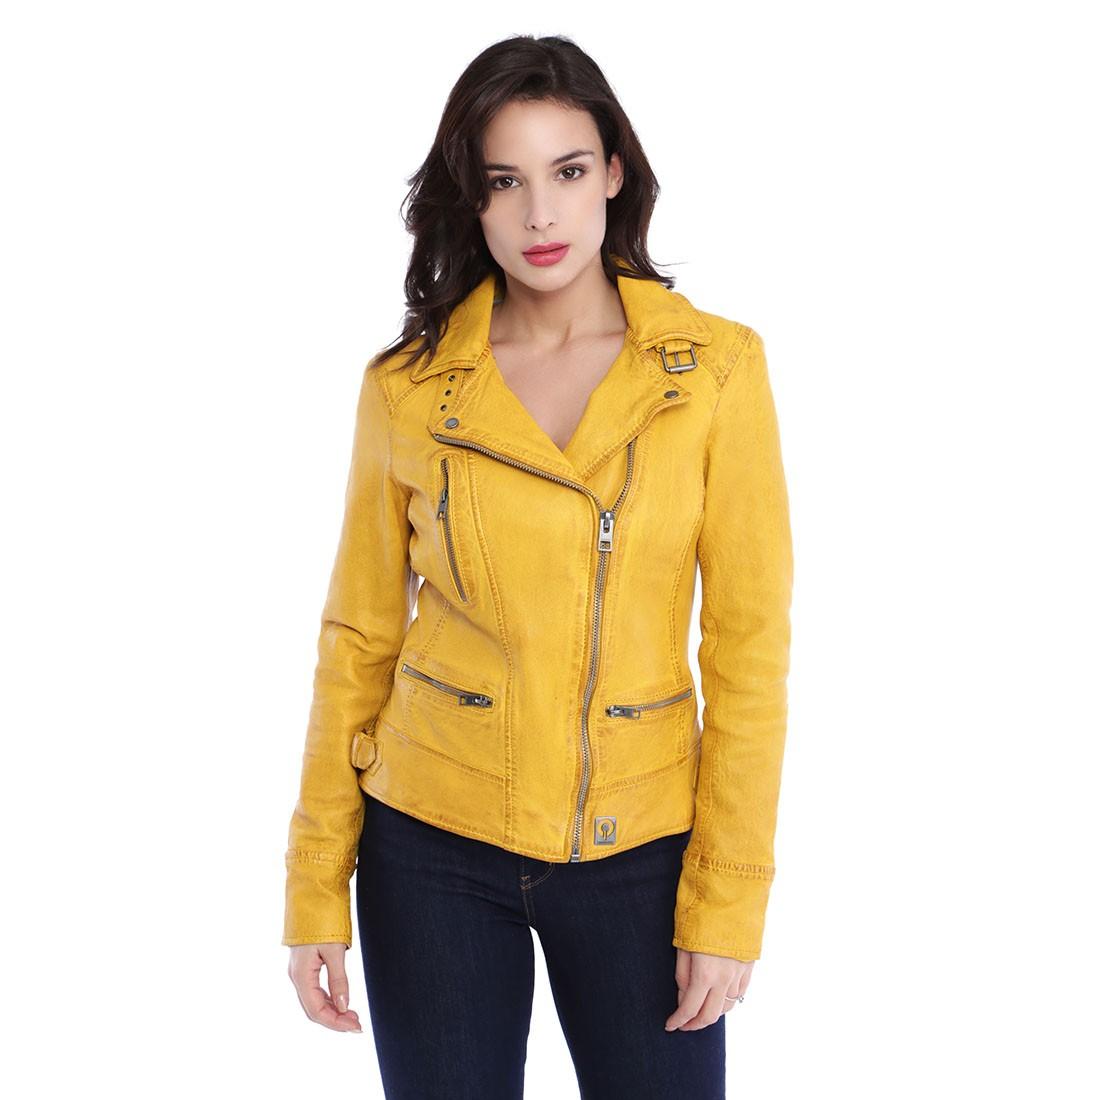 Blouson cuir oakwood femme jaune